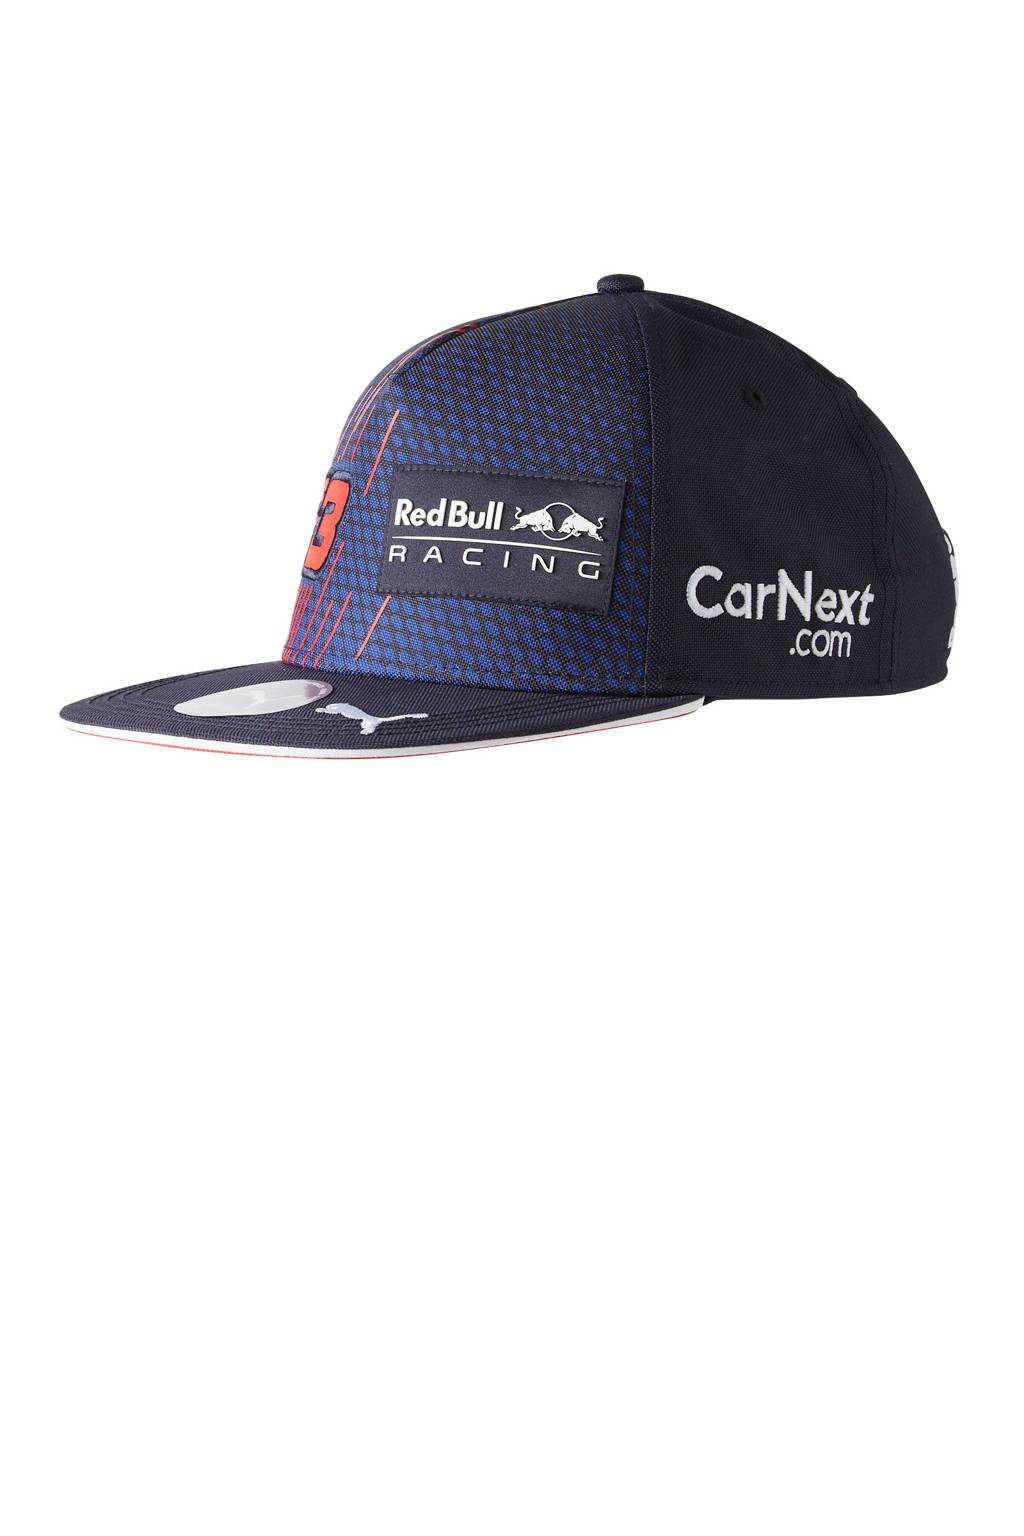 Puma Red Bull Racing Team pet donkerblauw, Donkerblauw/rood